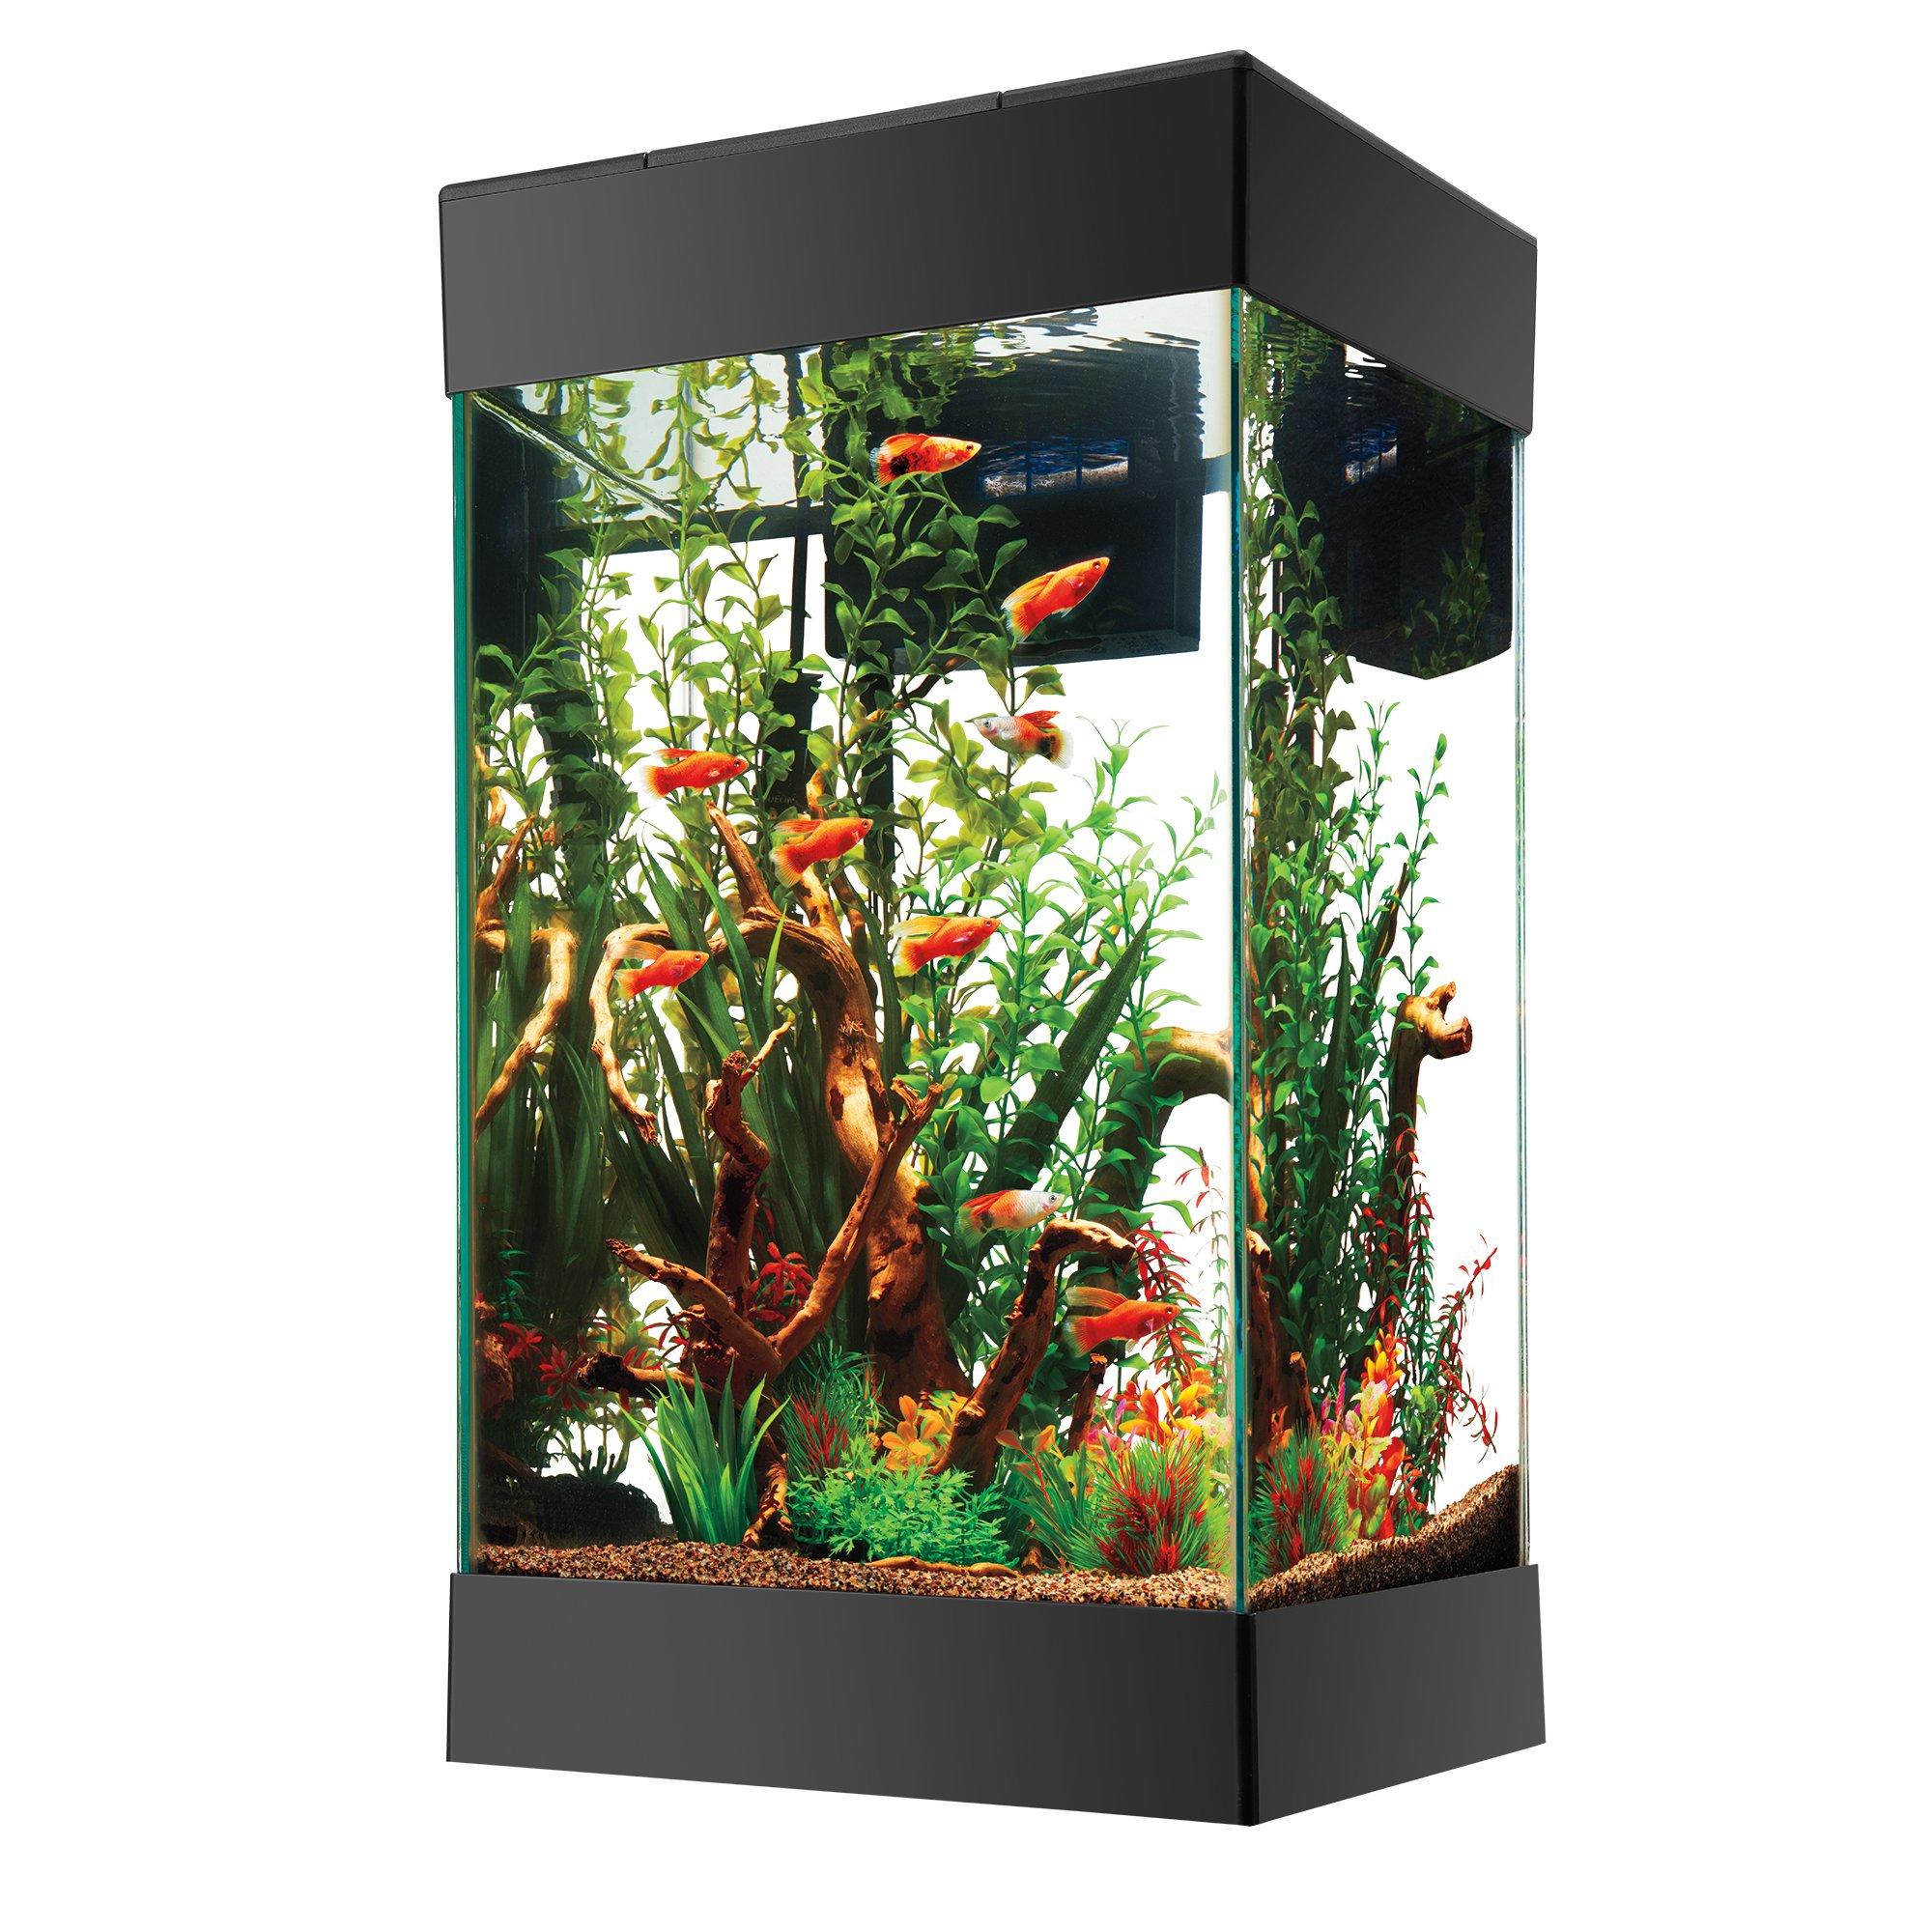 Aqueon 15 Gallon LED Column Aquarium Fish Tank Starter Kit